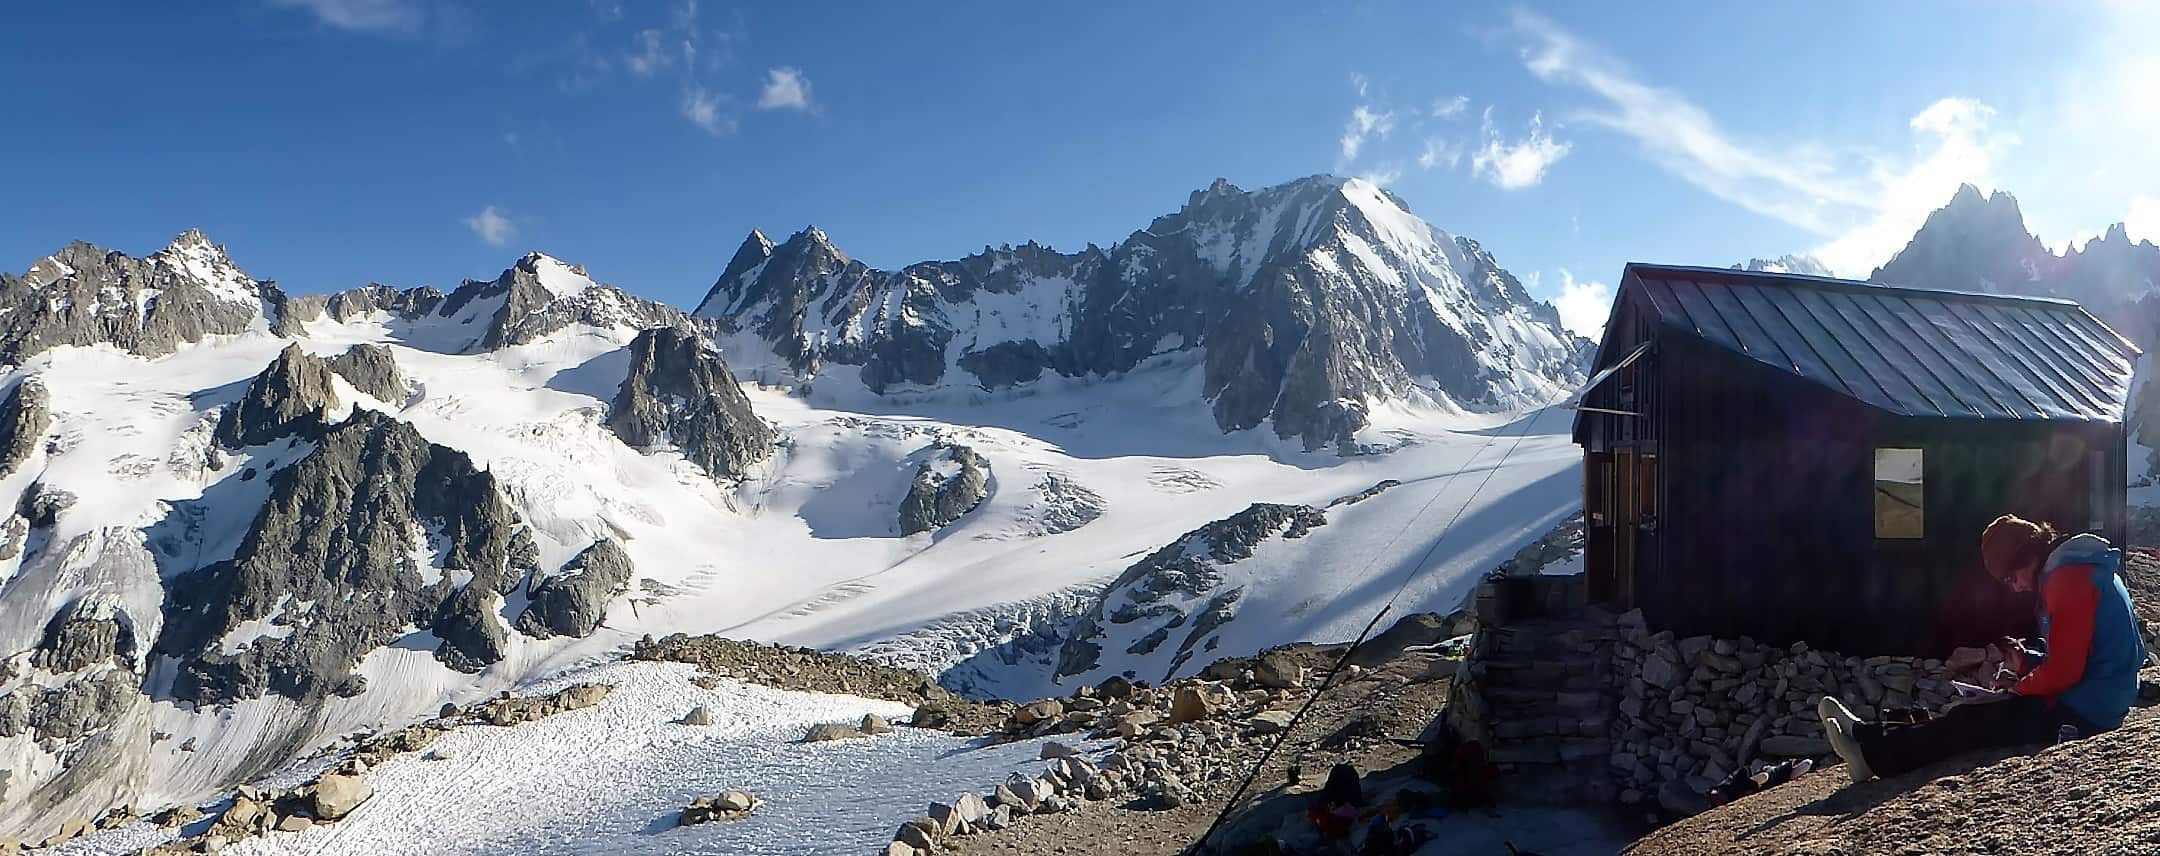 J+S Kursleiter 1 Bergsteigen im Orny- Trientgebiet Bivac Envers 1